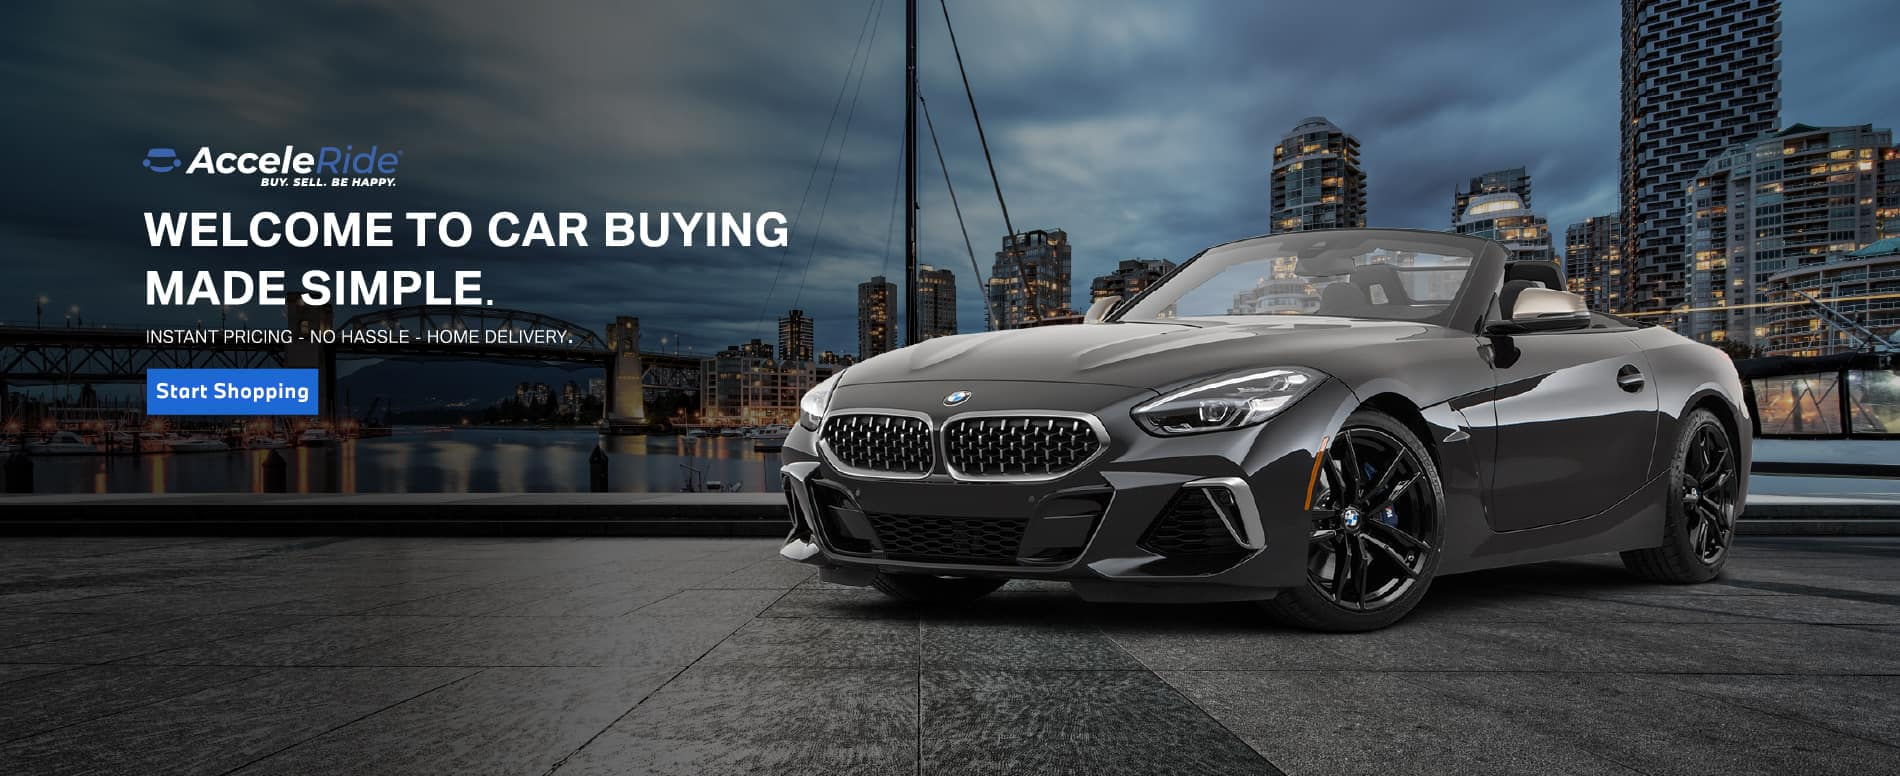 Slide-WelcomToCarBuying-AR-BMW